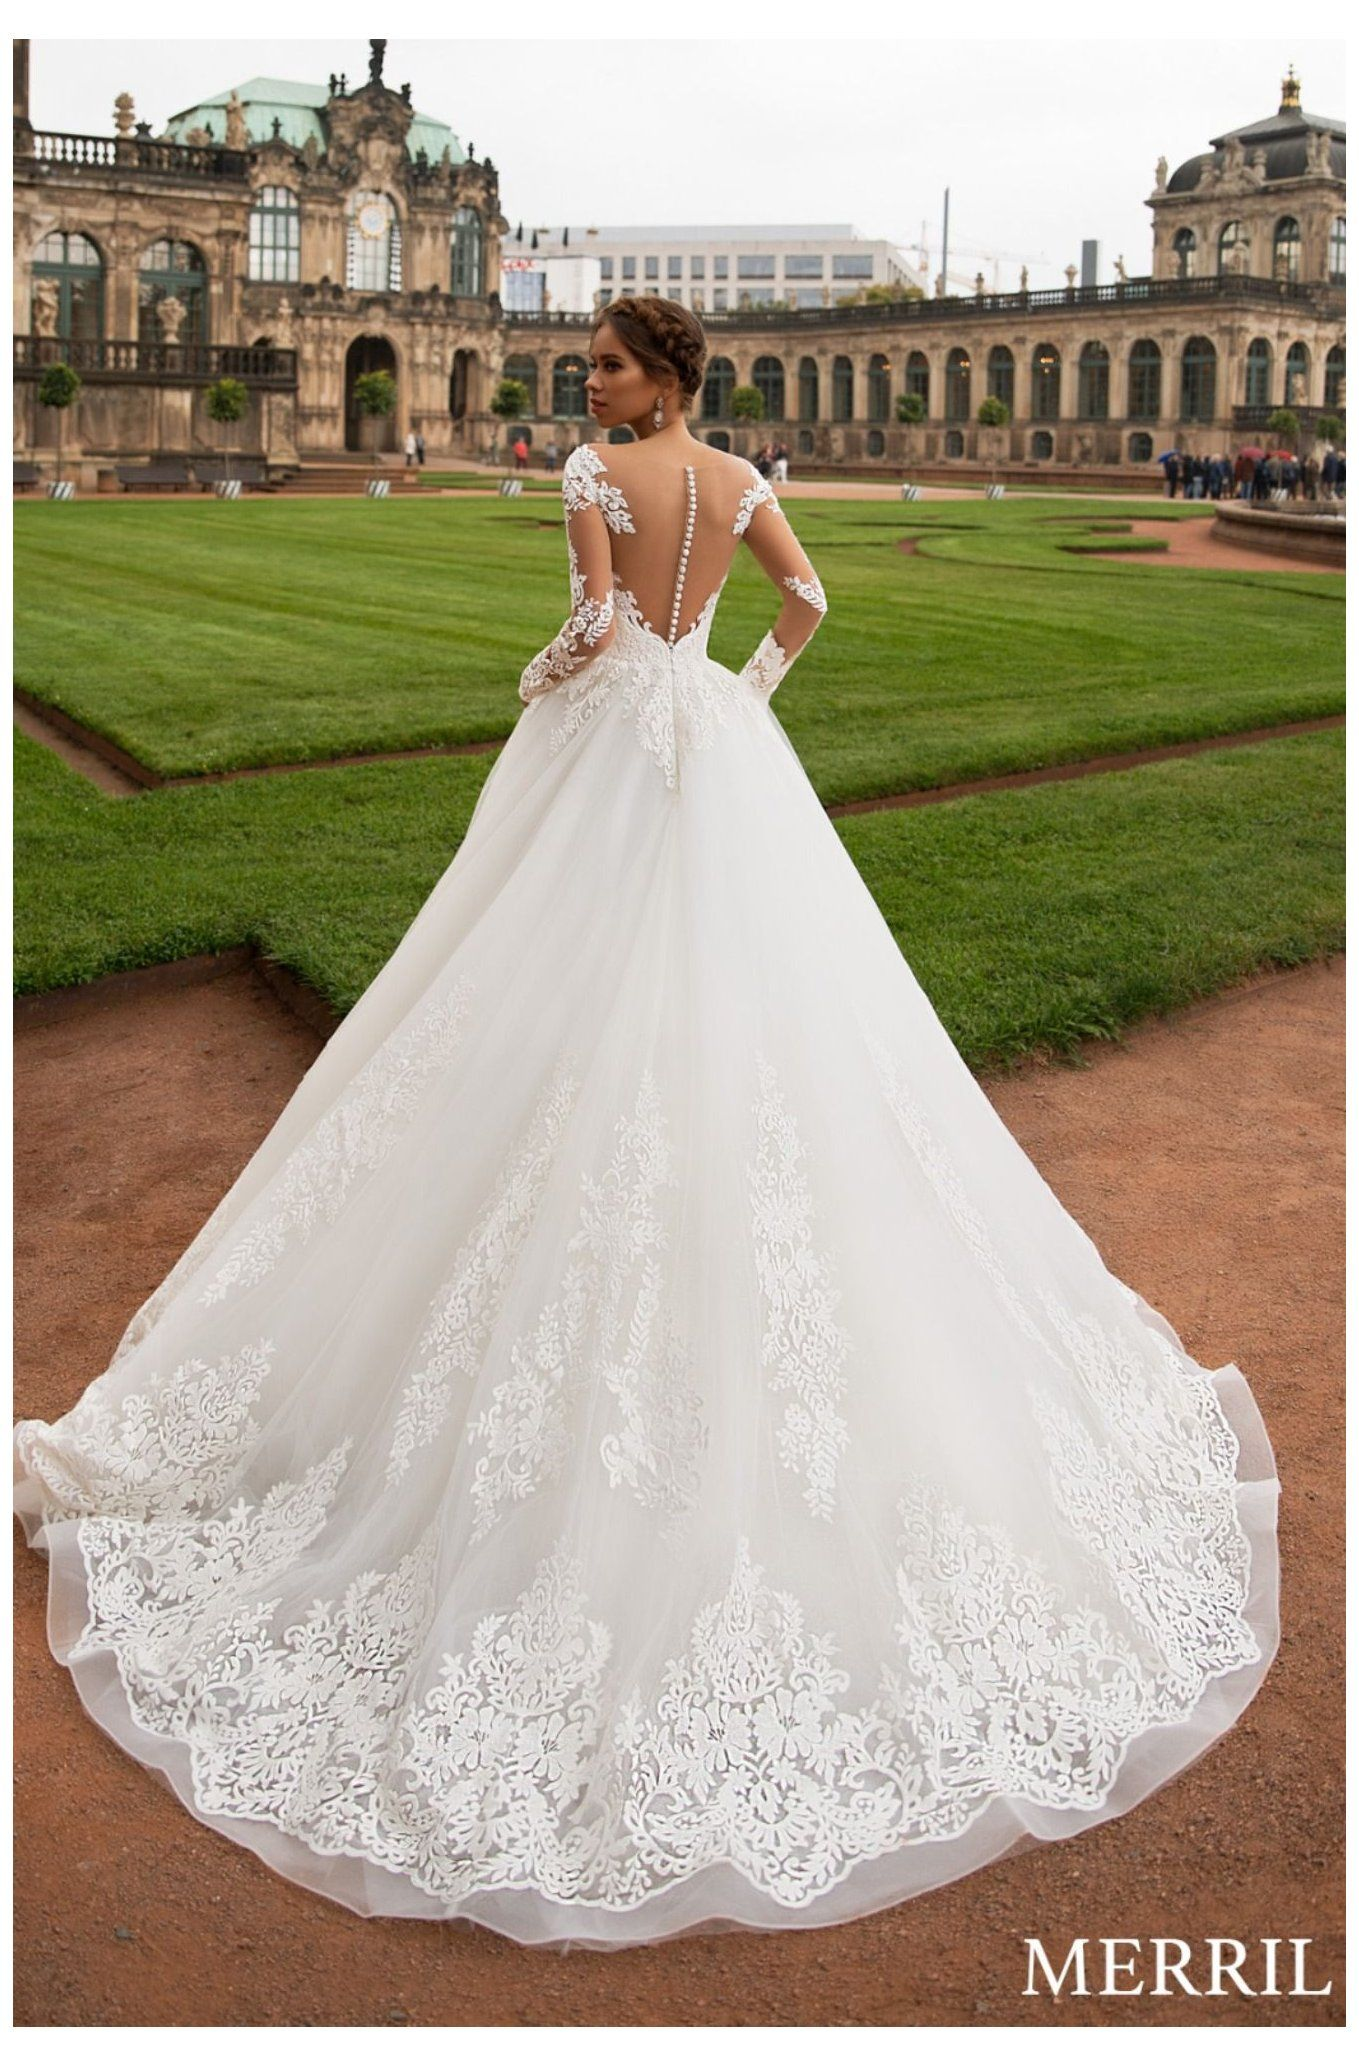 Merril Wedding Dress Royal Promenade Collection Elegant Wedding Dress C Elegant Wedding Dress Ballgown Elegant Wedding Dresses Lace Fancy Wedding Dresses [ 2066 x 1359 Pixel ]